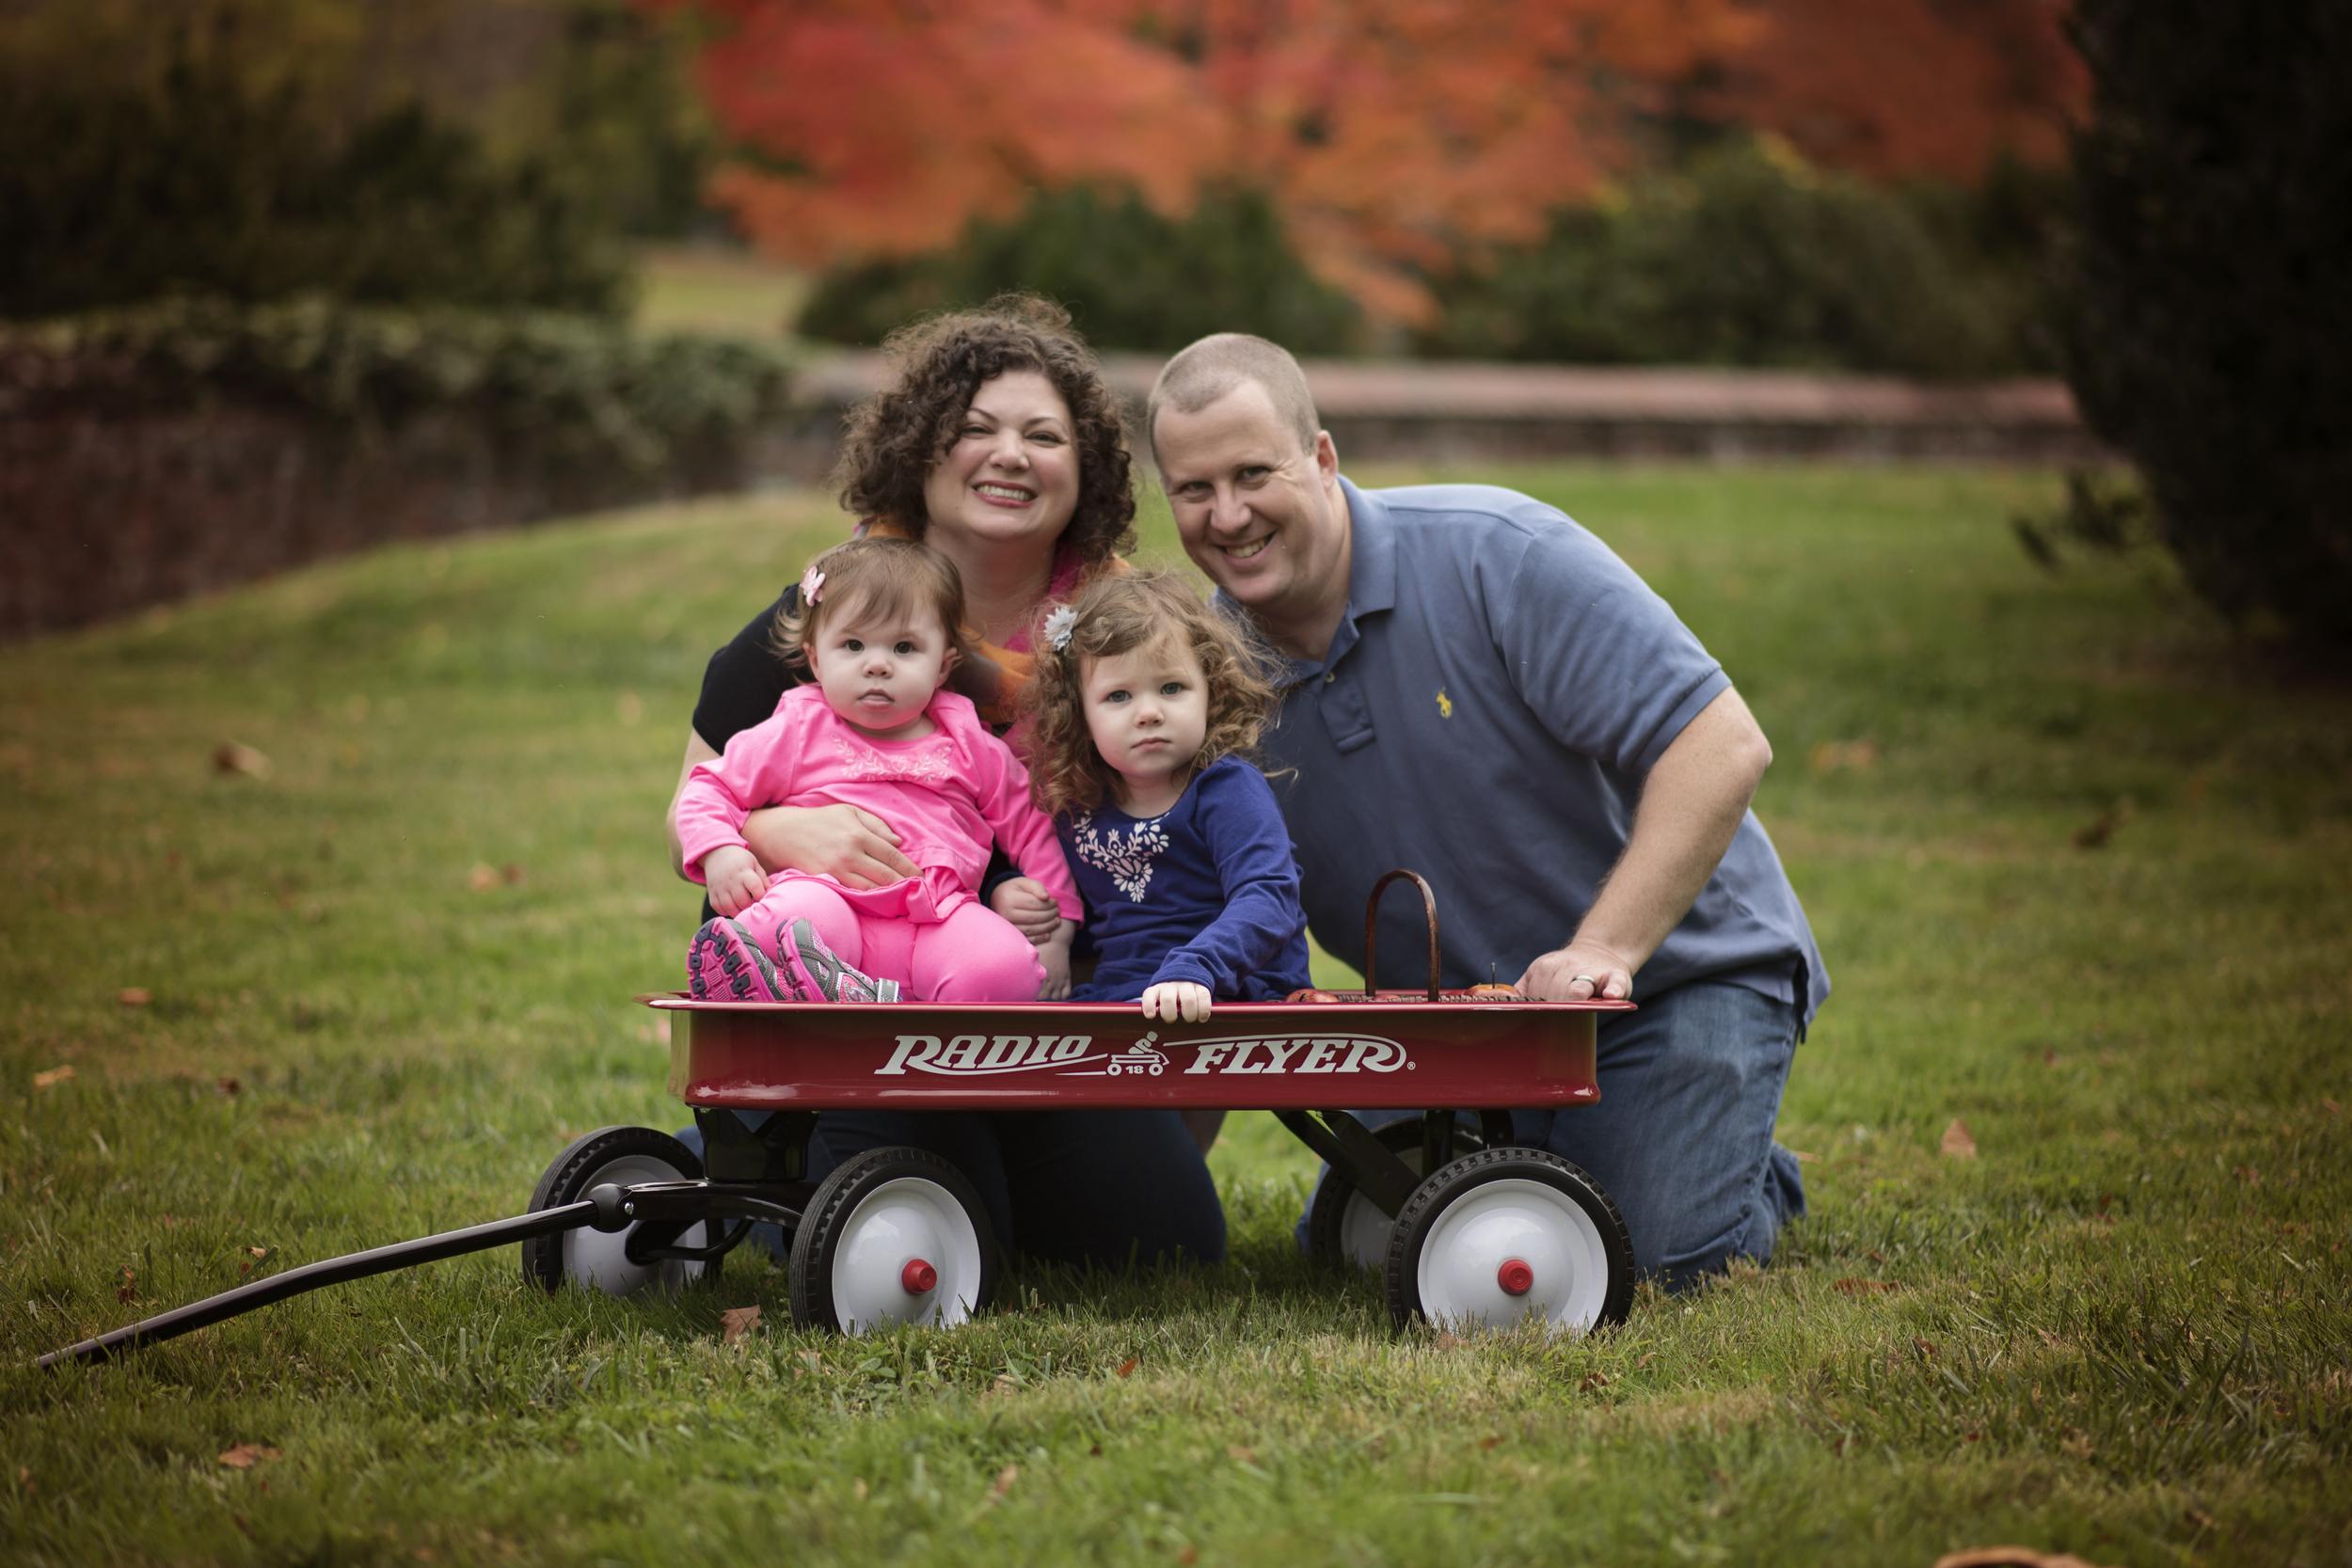 Family with Radio Flyer Wagon Portrait Photographer Kate Montaner